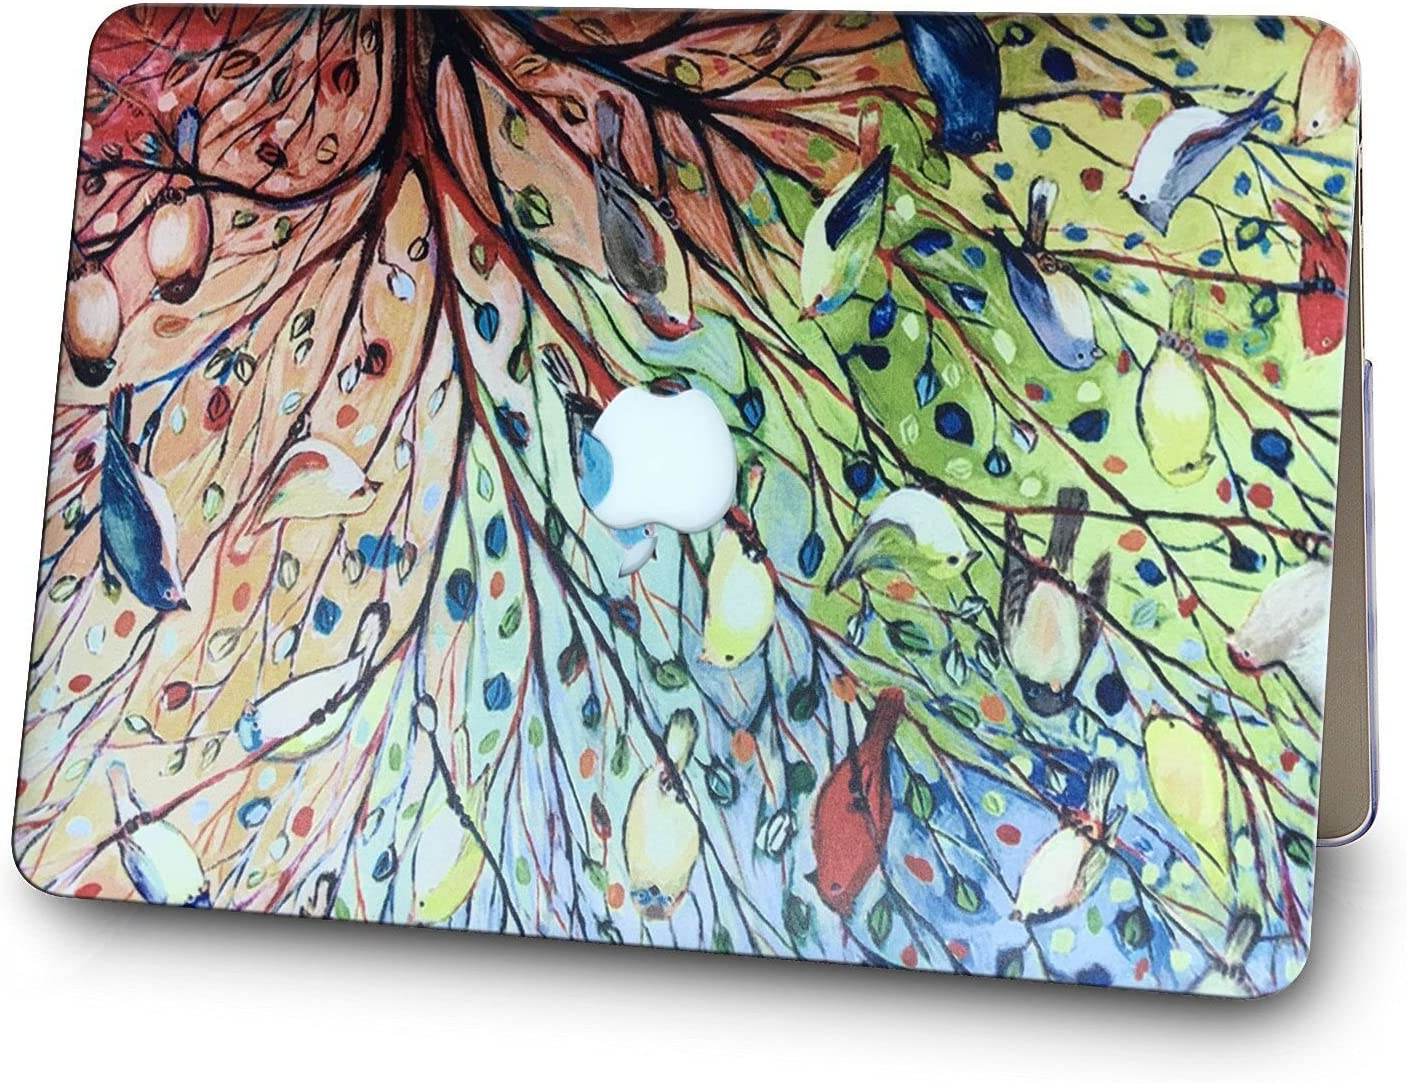 Brain SAYA Protective Waterproof Hard Case Cover Shell for MacBook Pro 13 Inch Model A 1278 Non-Retina